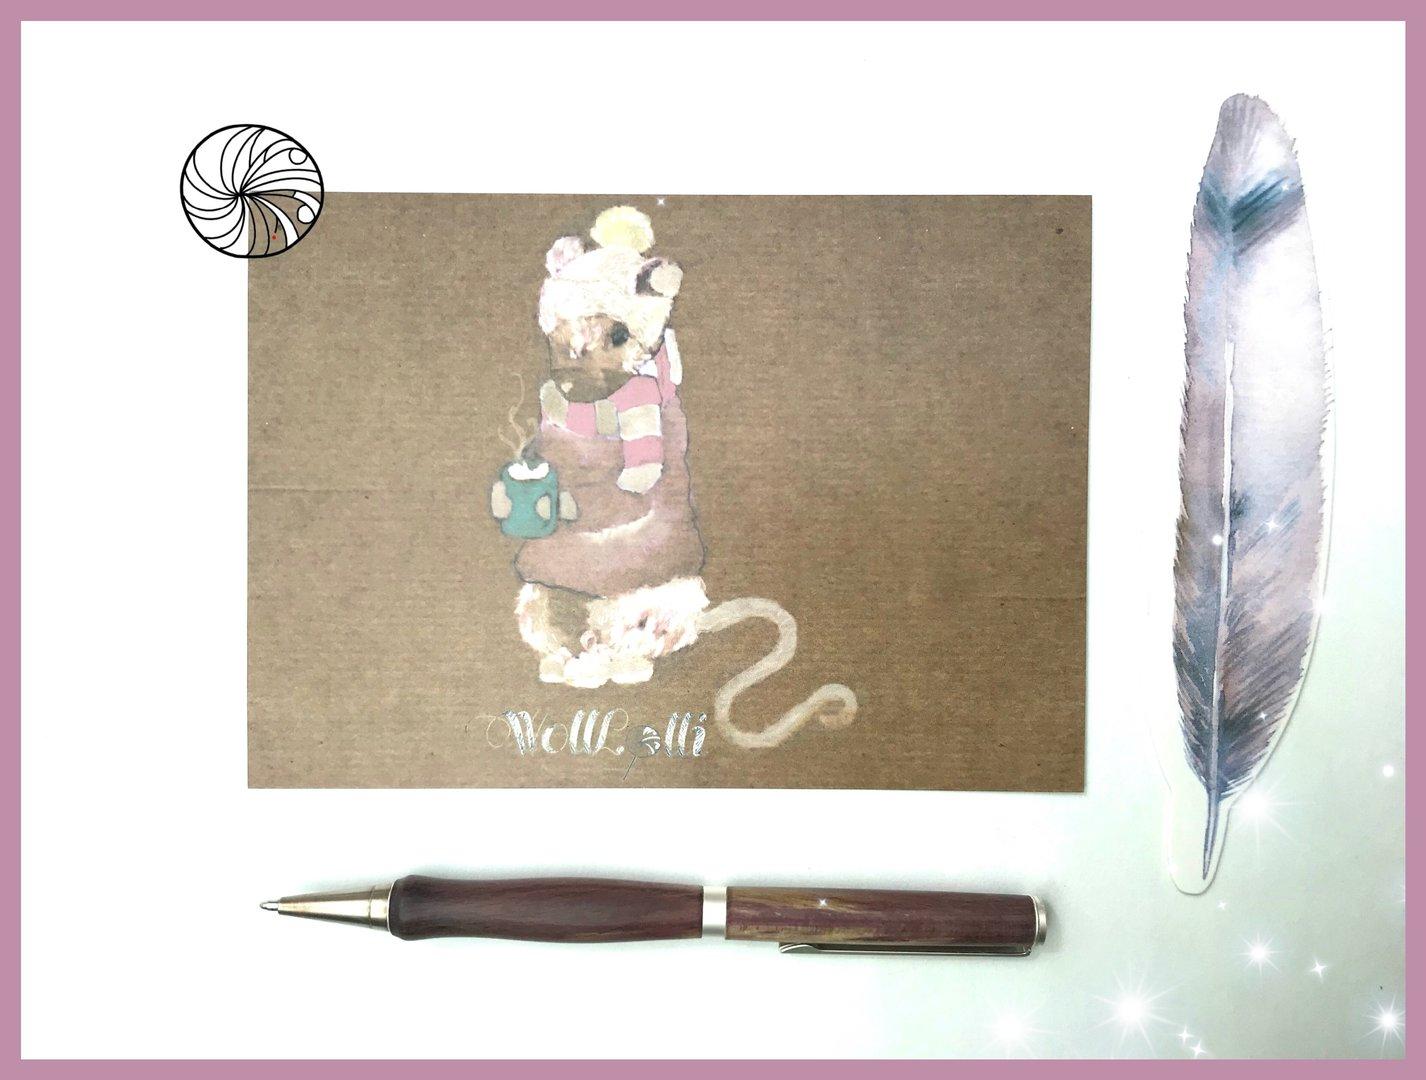 Wolllolli Postkarte Guten Morgen Maus